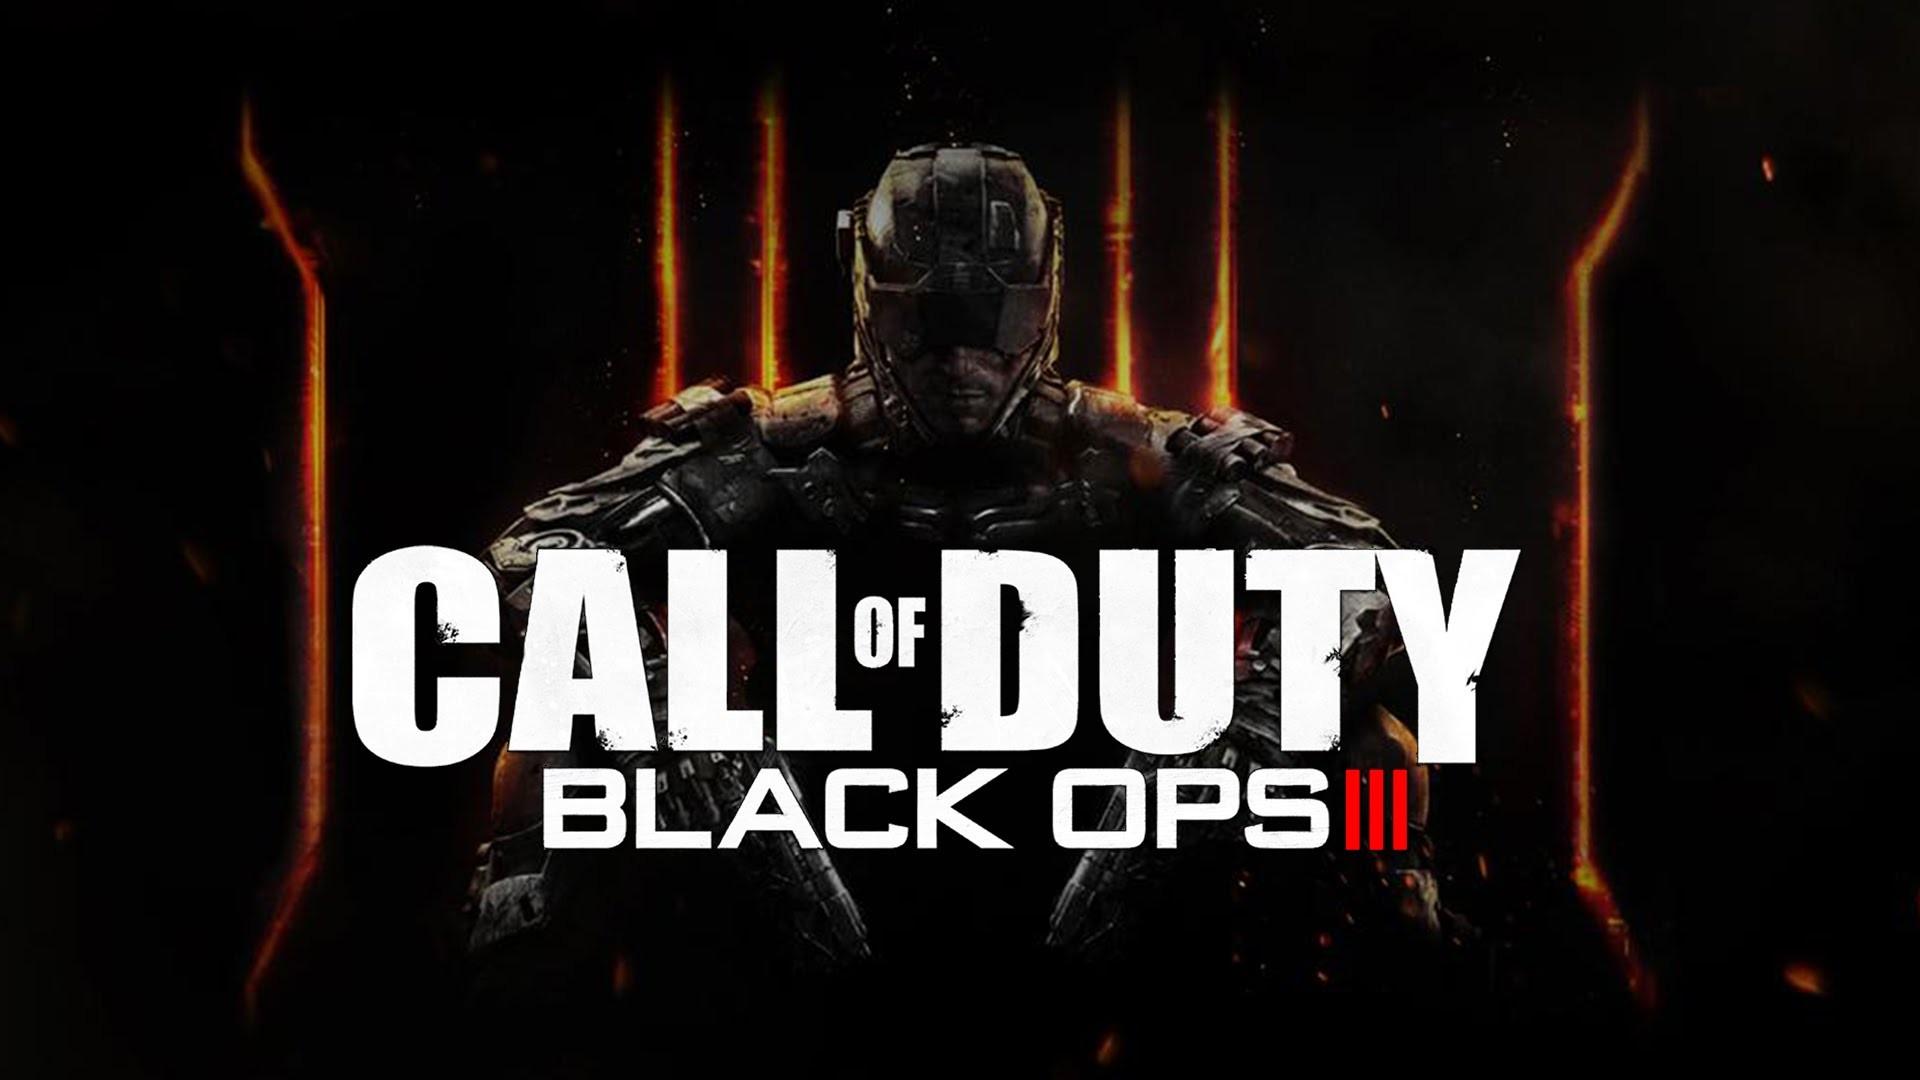 Call Of Duty Black Ops Iii Wallpapers Sf Wallpaper